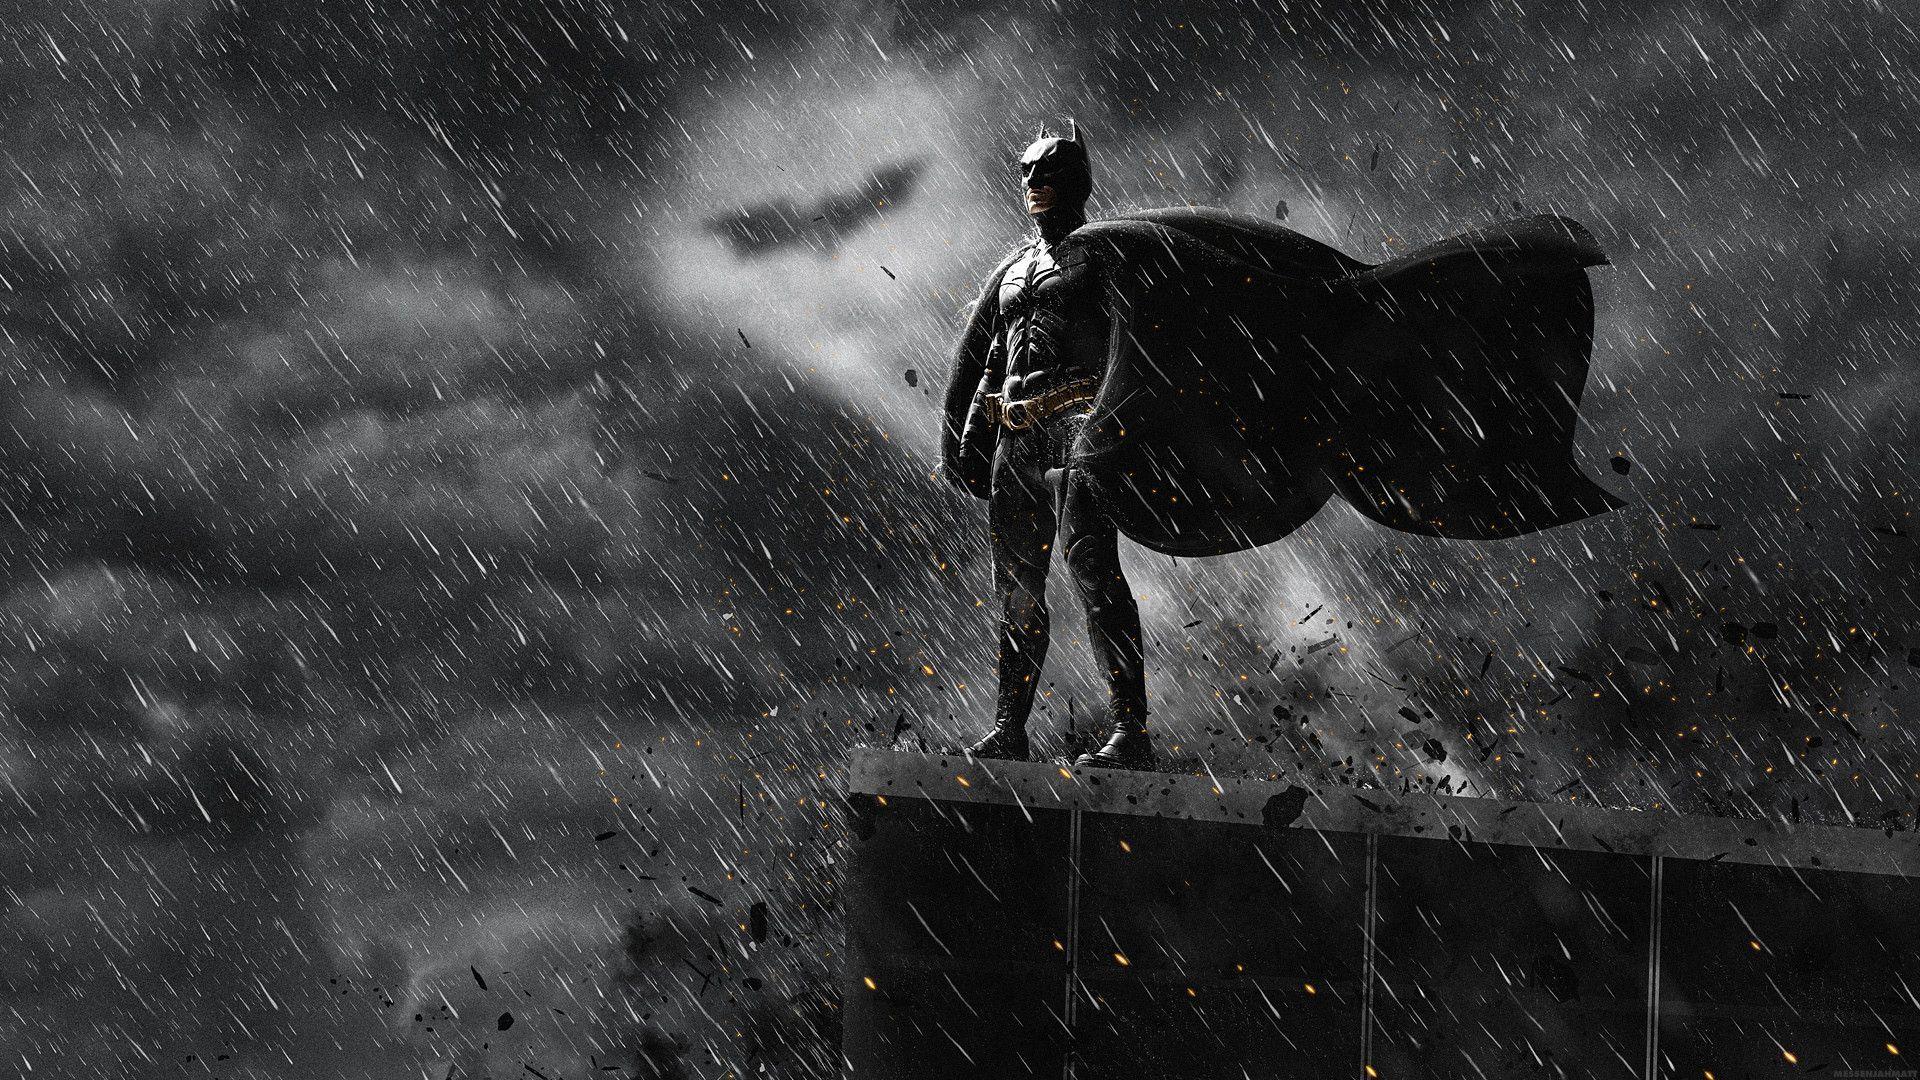 31 Awesome Hd Dark Knight Wallpaper On Wallpapersafari